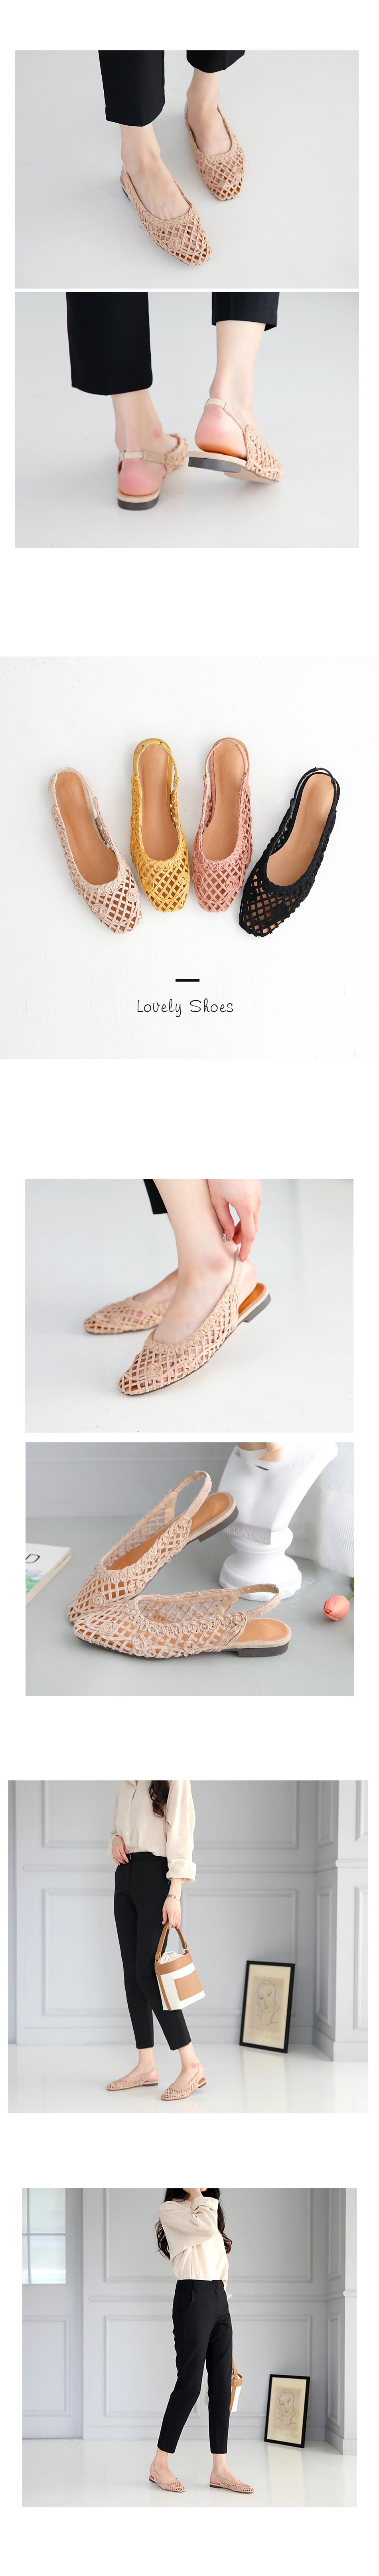 Francesche Slingback Flat Shoes 1cm